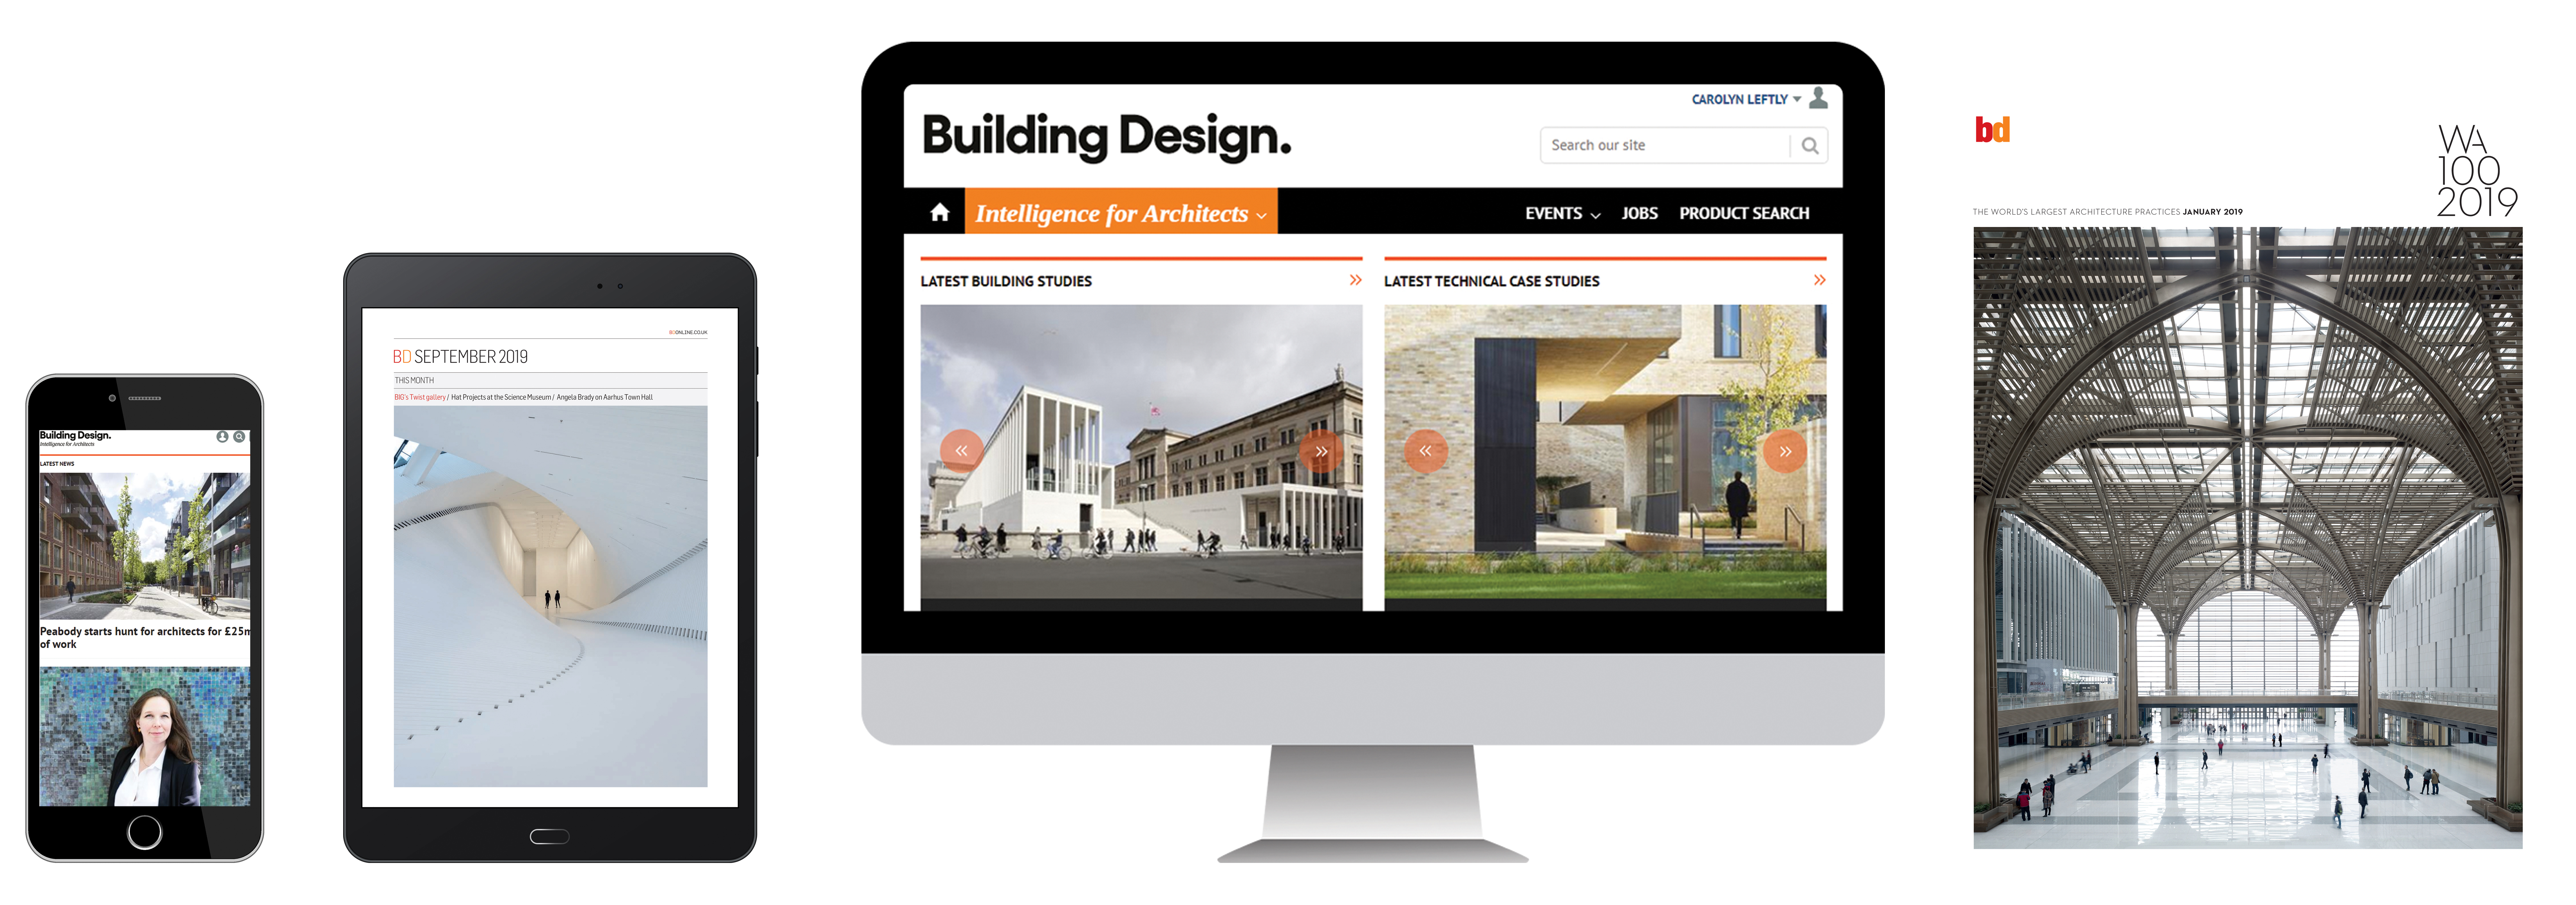 Building Design subscriptions landing page